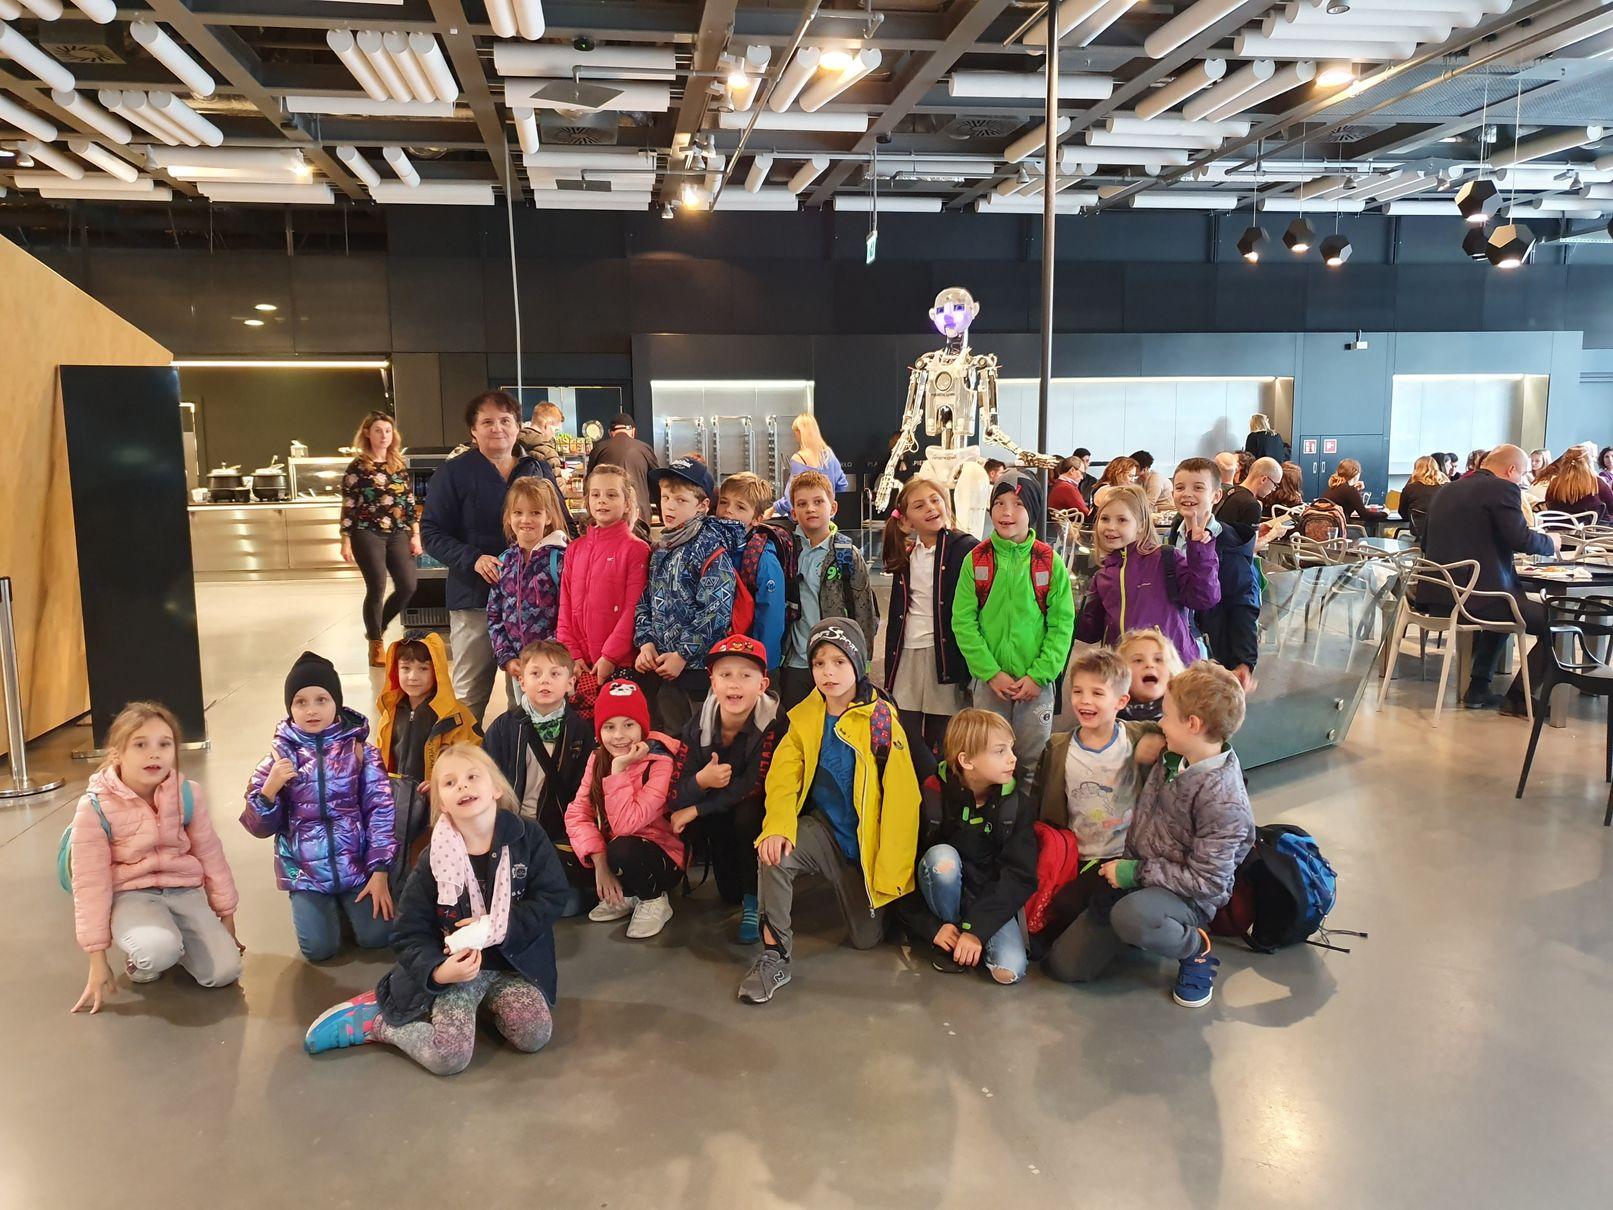 Wyjazd klas 2b i 2c do Centrum Nauki Kopernik